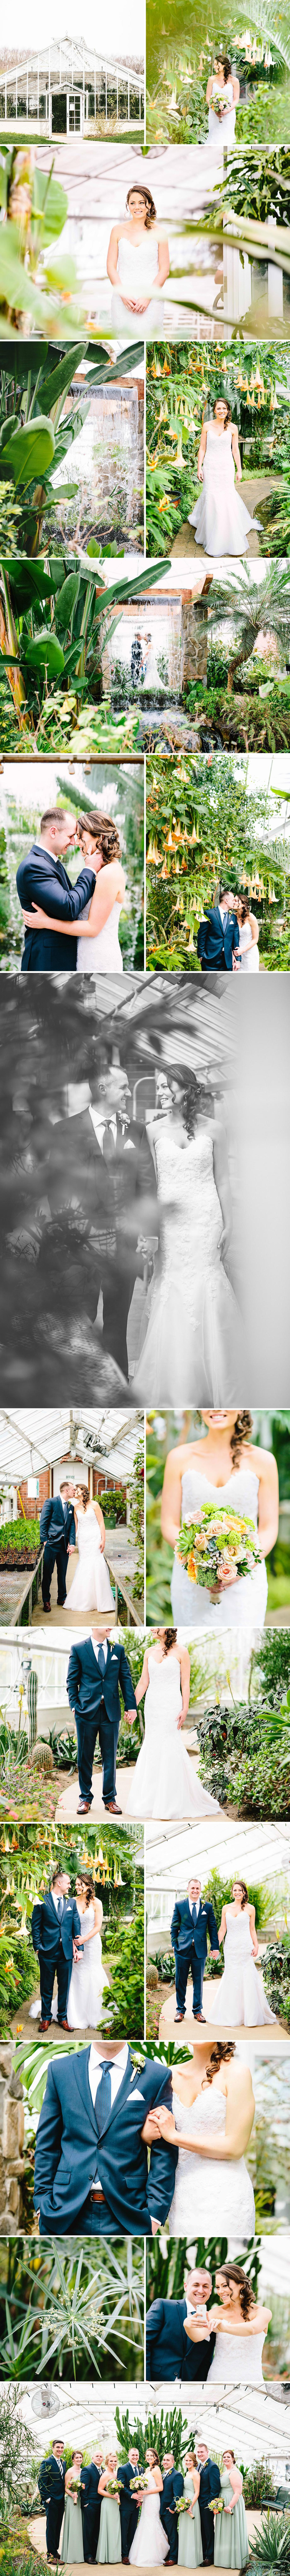 chicago-fine-art-wedding-photography-scallate